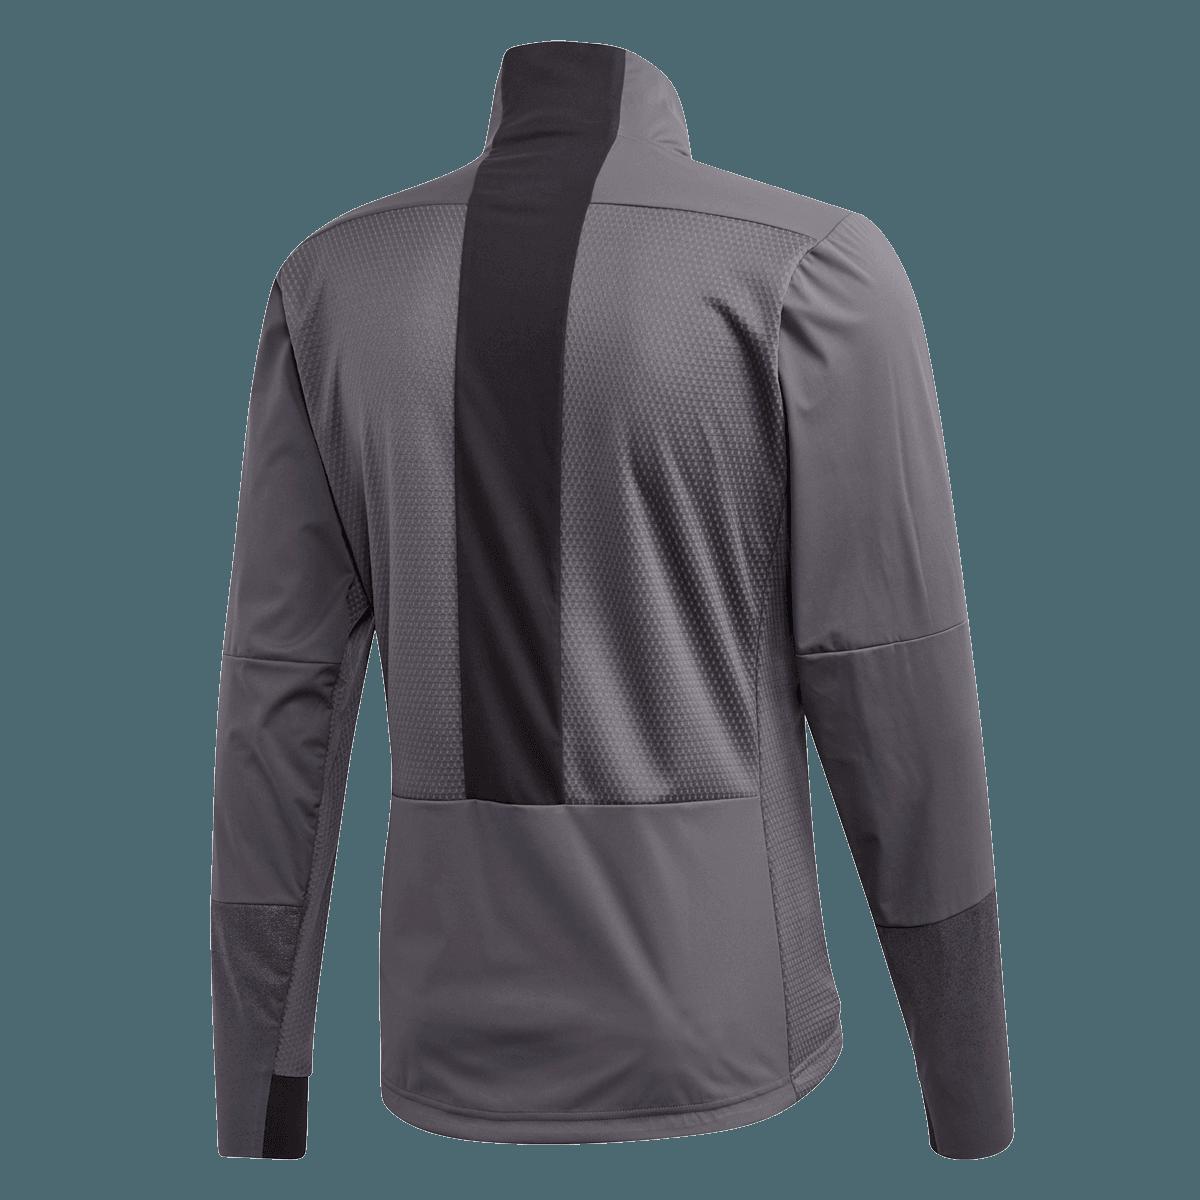 adidas Outdoorjacke Terrex insulated Jacket orangeschwarz